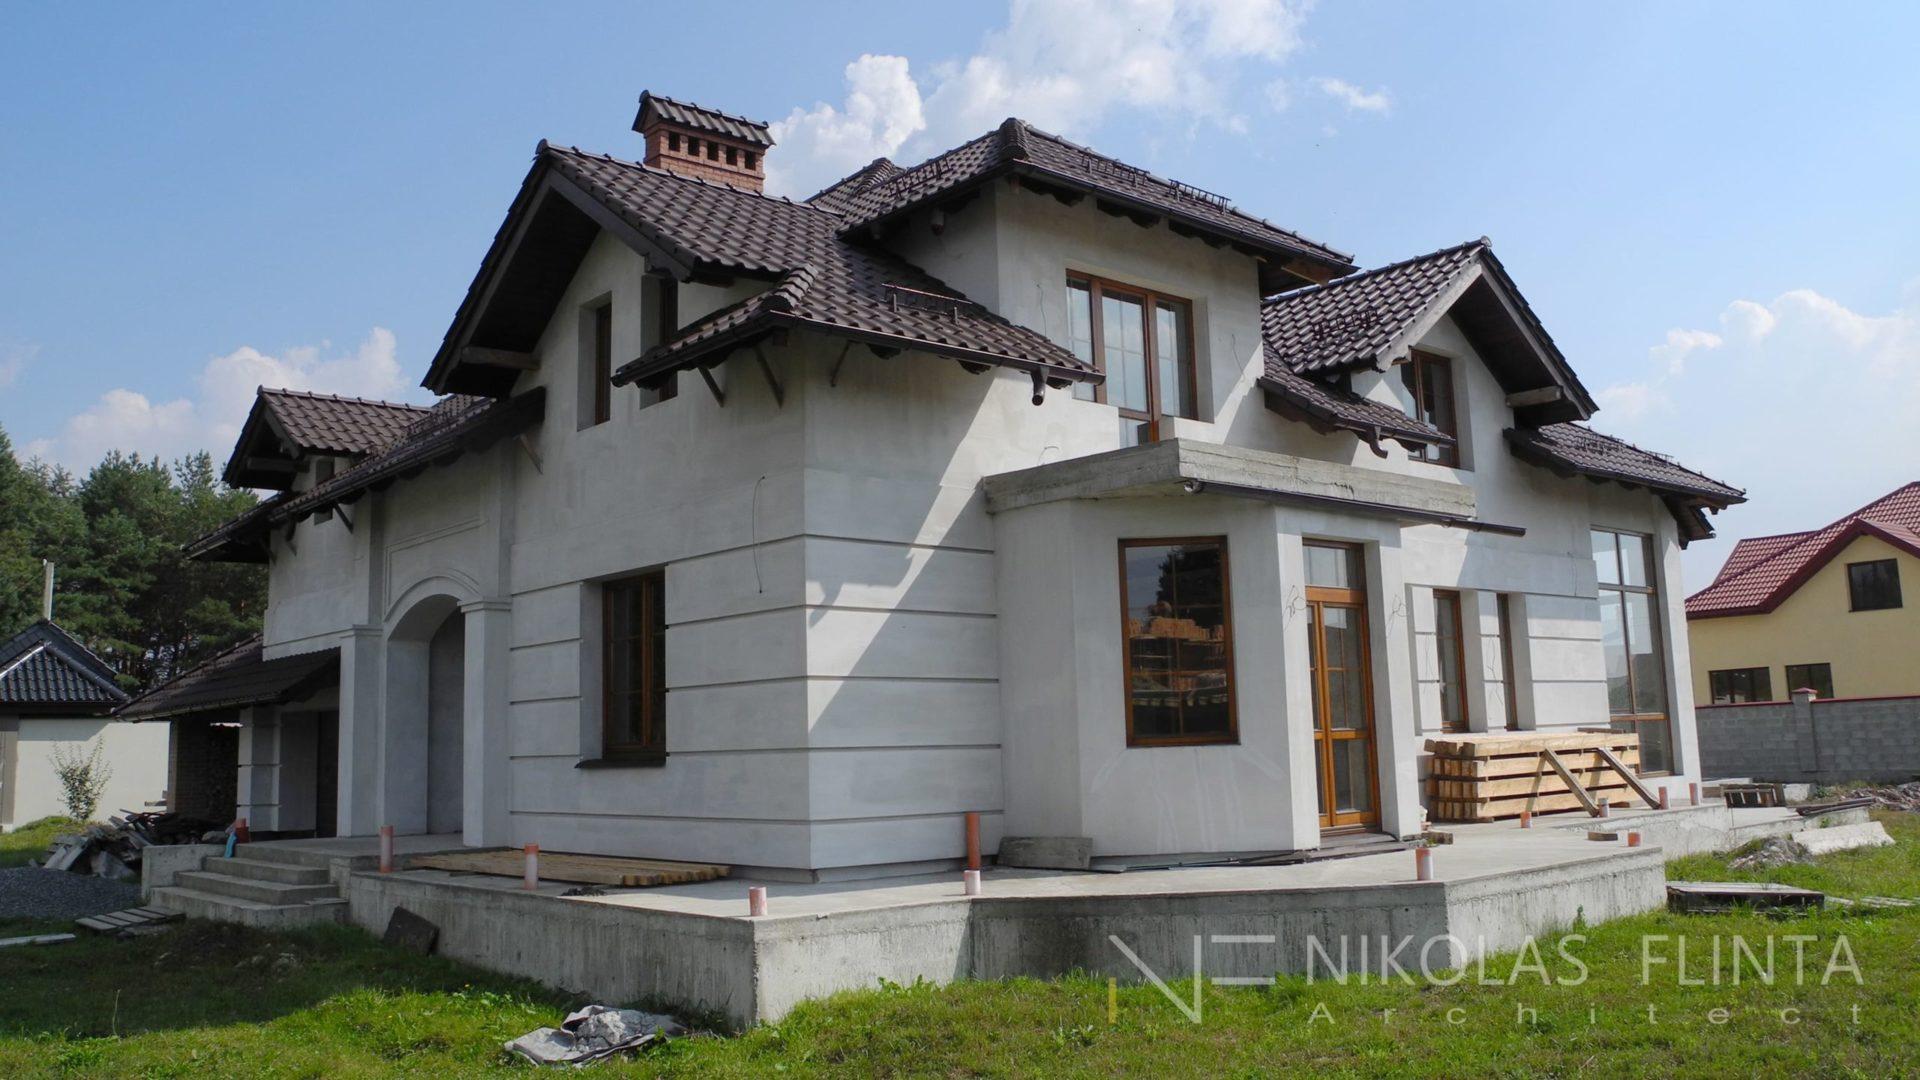 House-06BA_02-scaled.jpg